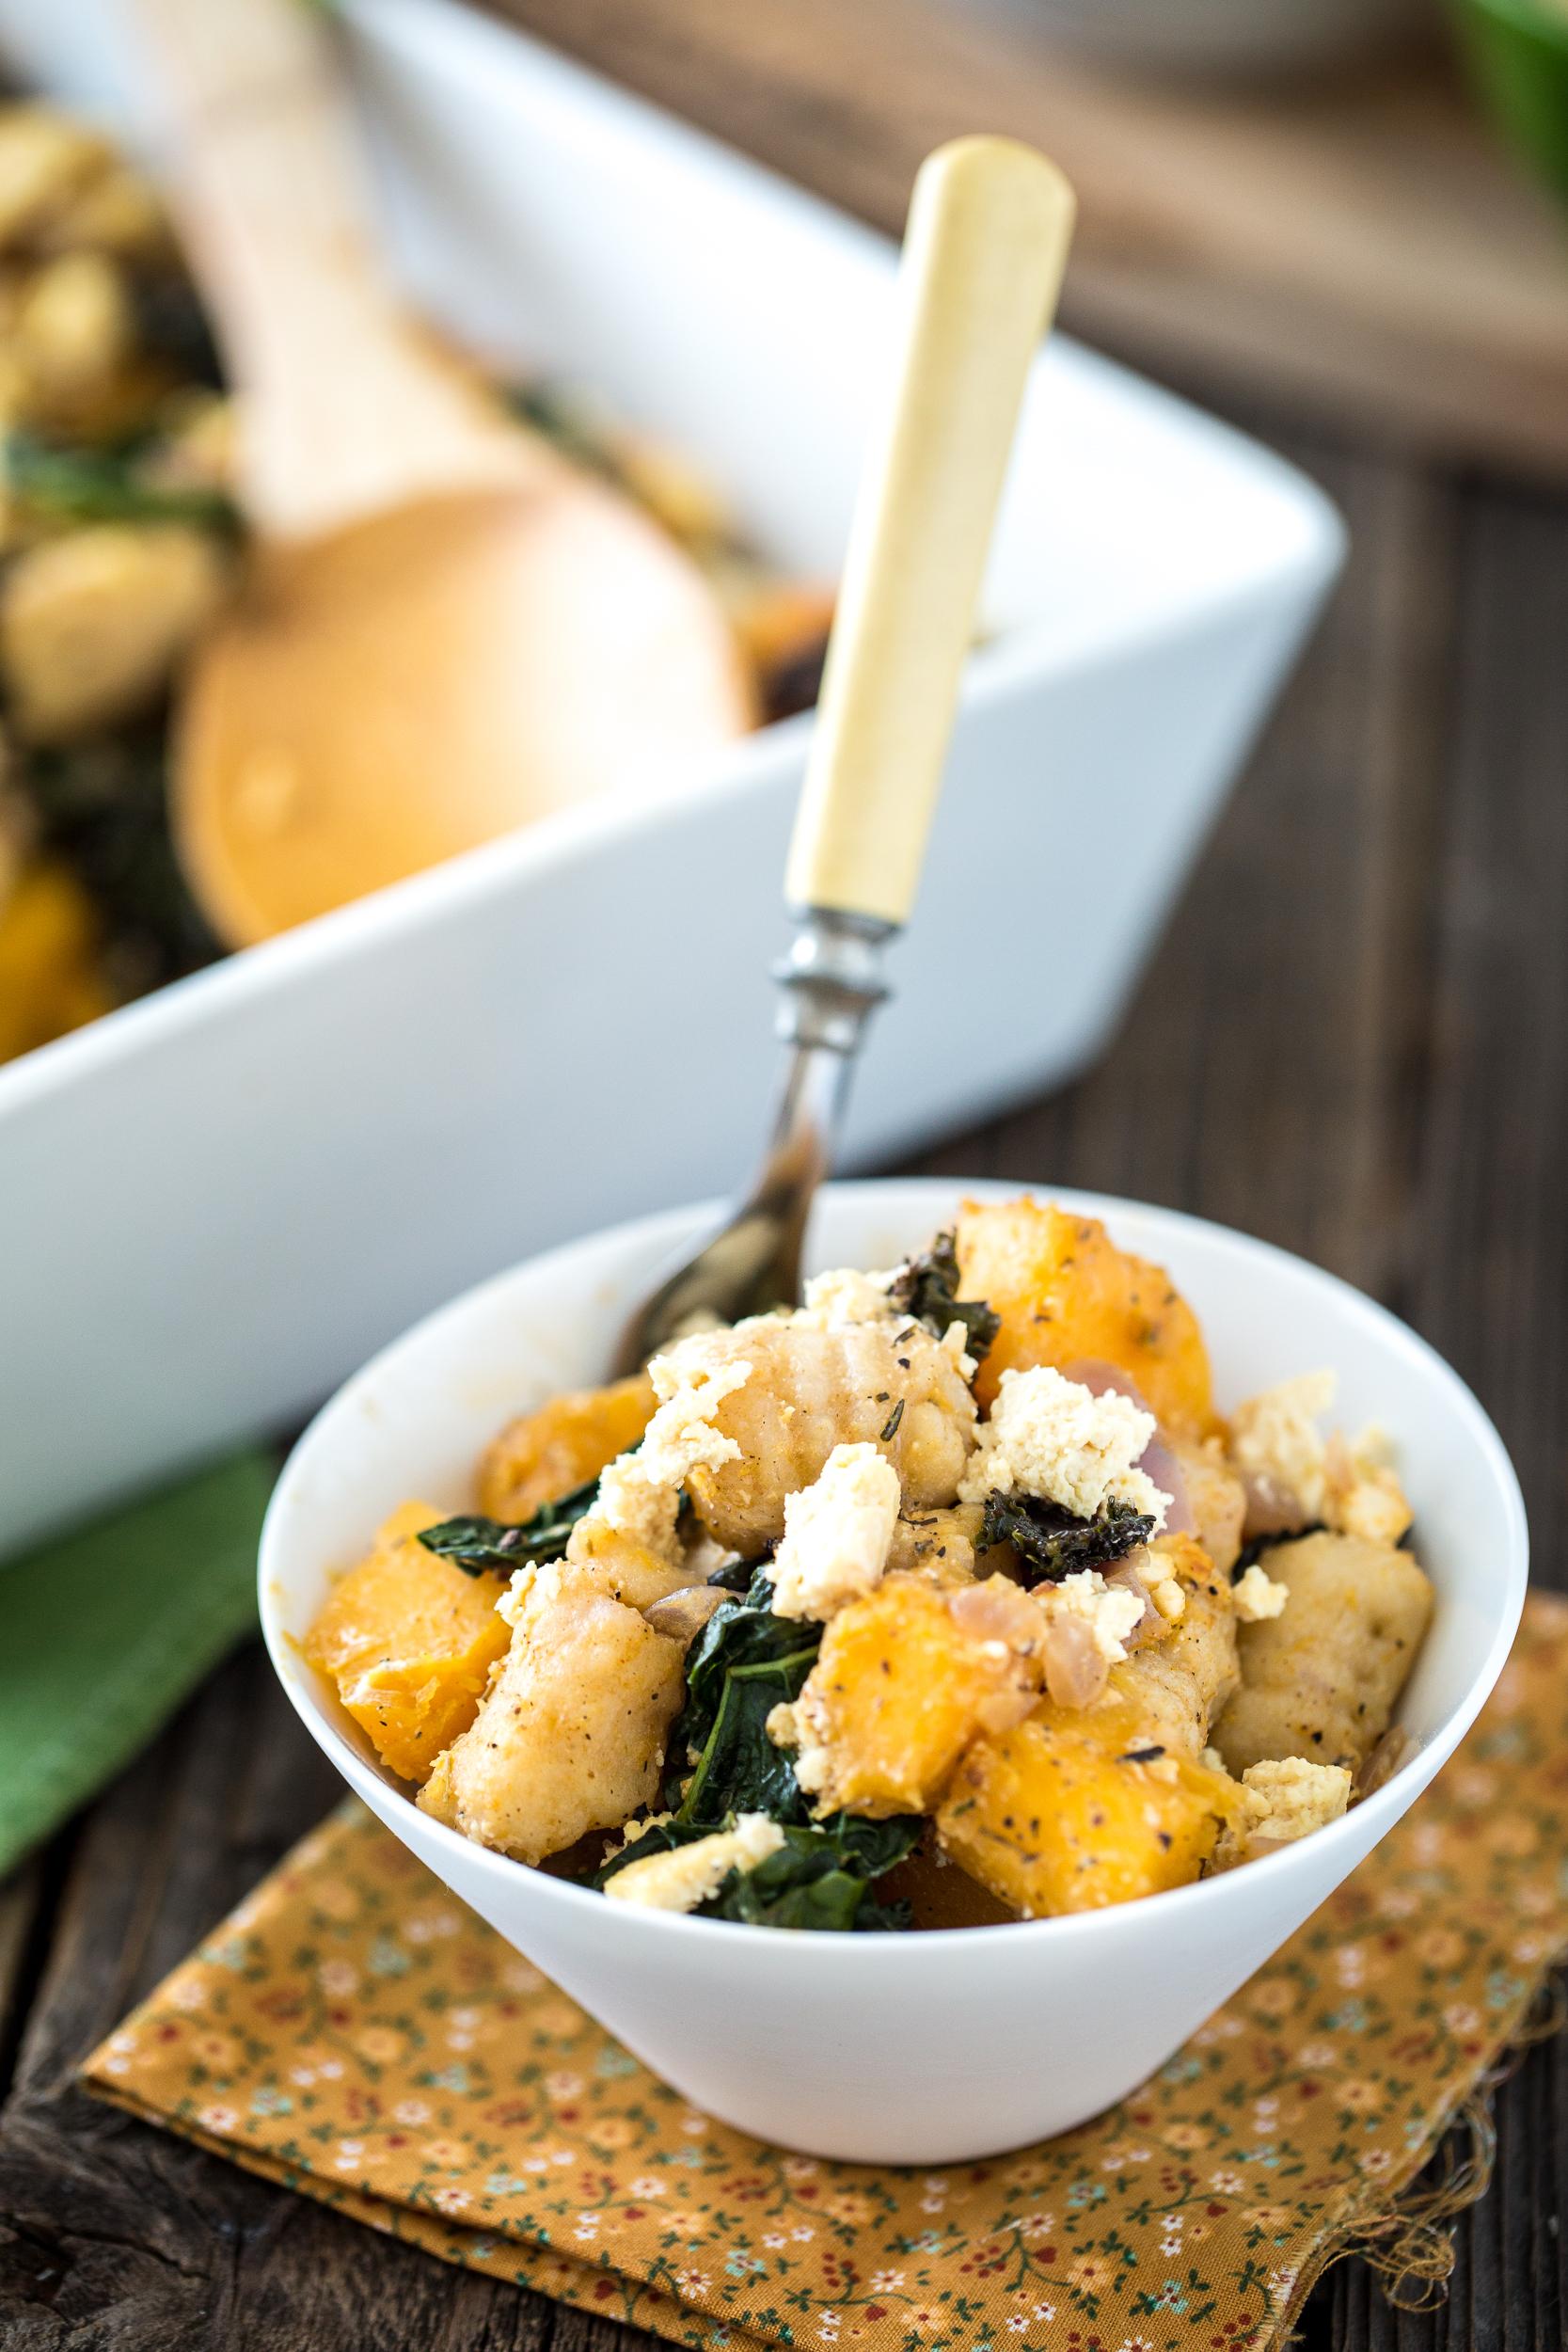 Butternut Squash, Kale, Chèvre & Gnocchi Casserole